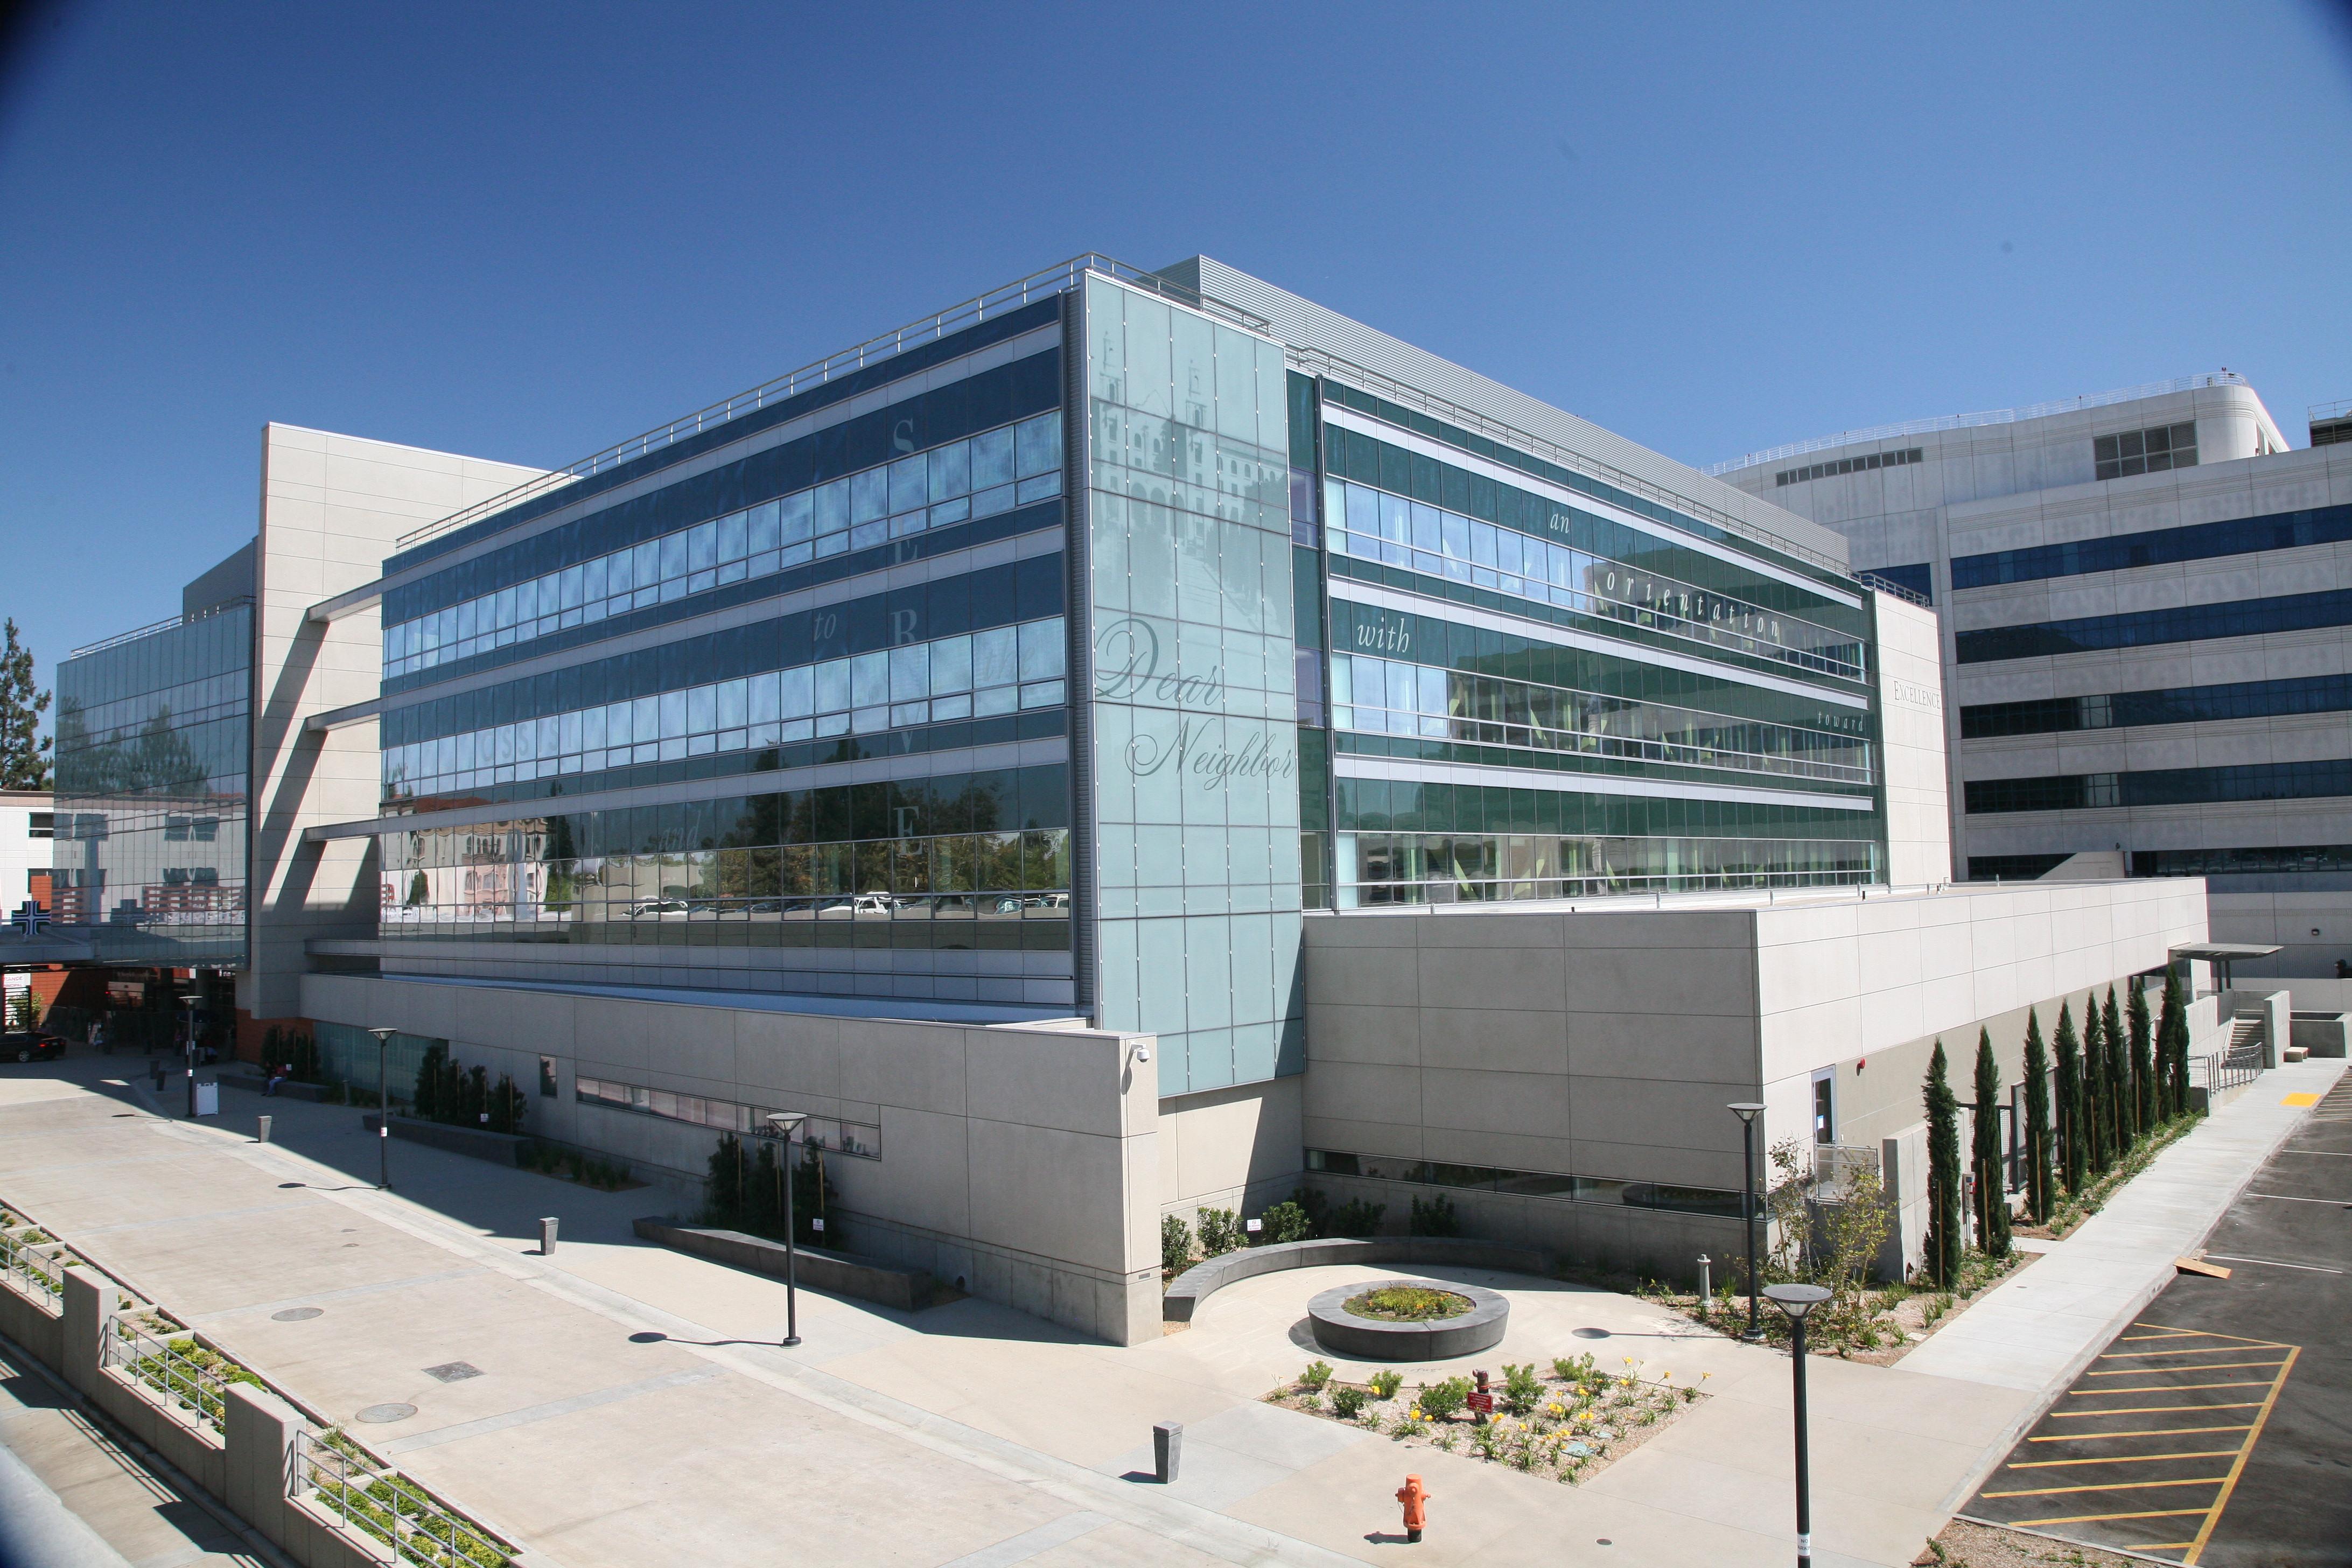 St Joseph Hospital Hospital of Orange Calif. | Glazing contractor: Model Glass | Architect: NBBJ | Glass: PPG SolarBan 60 and 80 with custom silkscreen